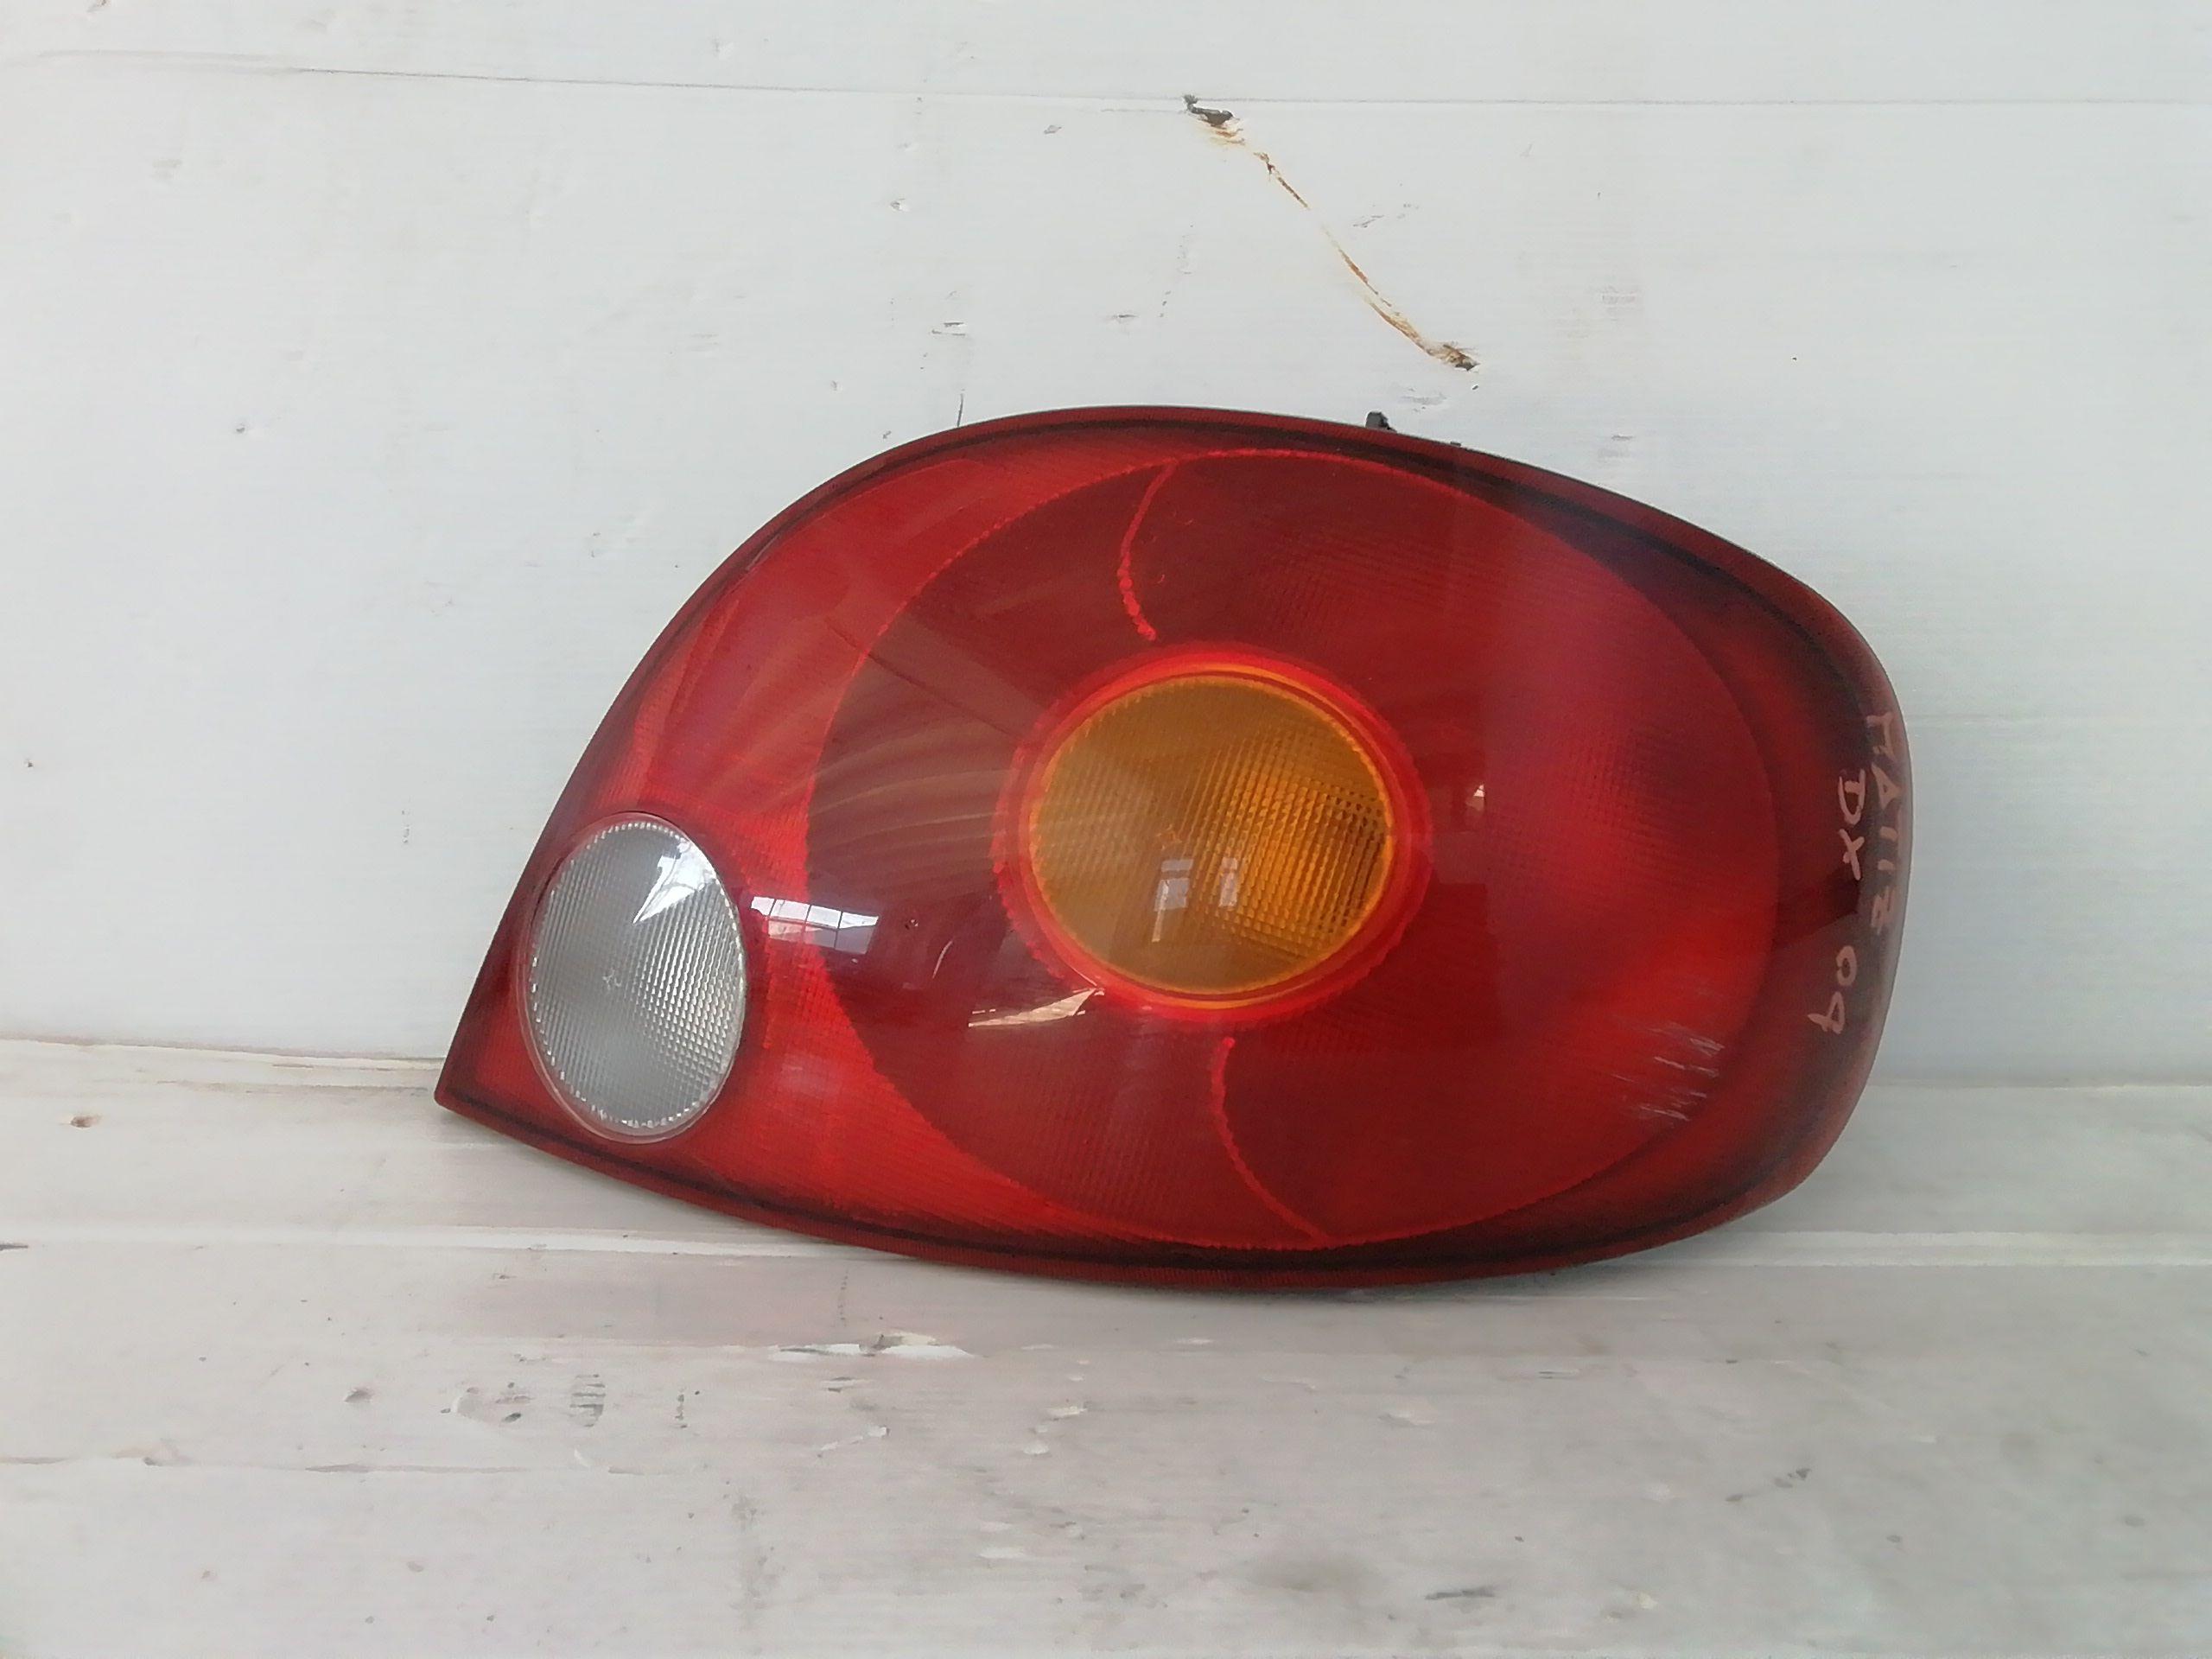 STOP FANALE POSTERIORE DESTRO PASSEGGERO DAEWOO Matiz 2° Serie Benzina (2004) RICAMBI USATI